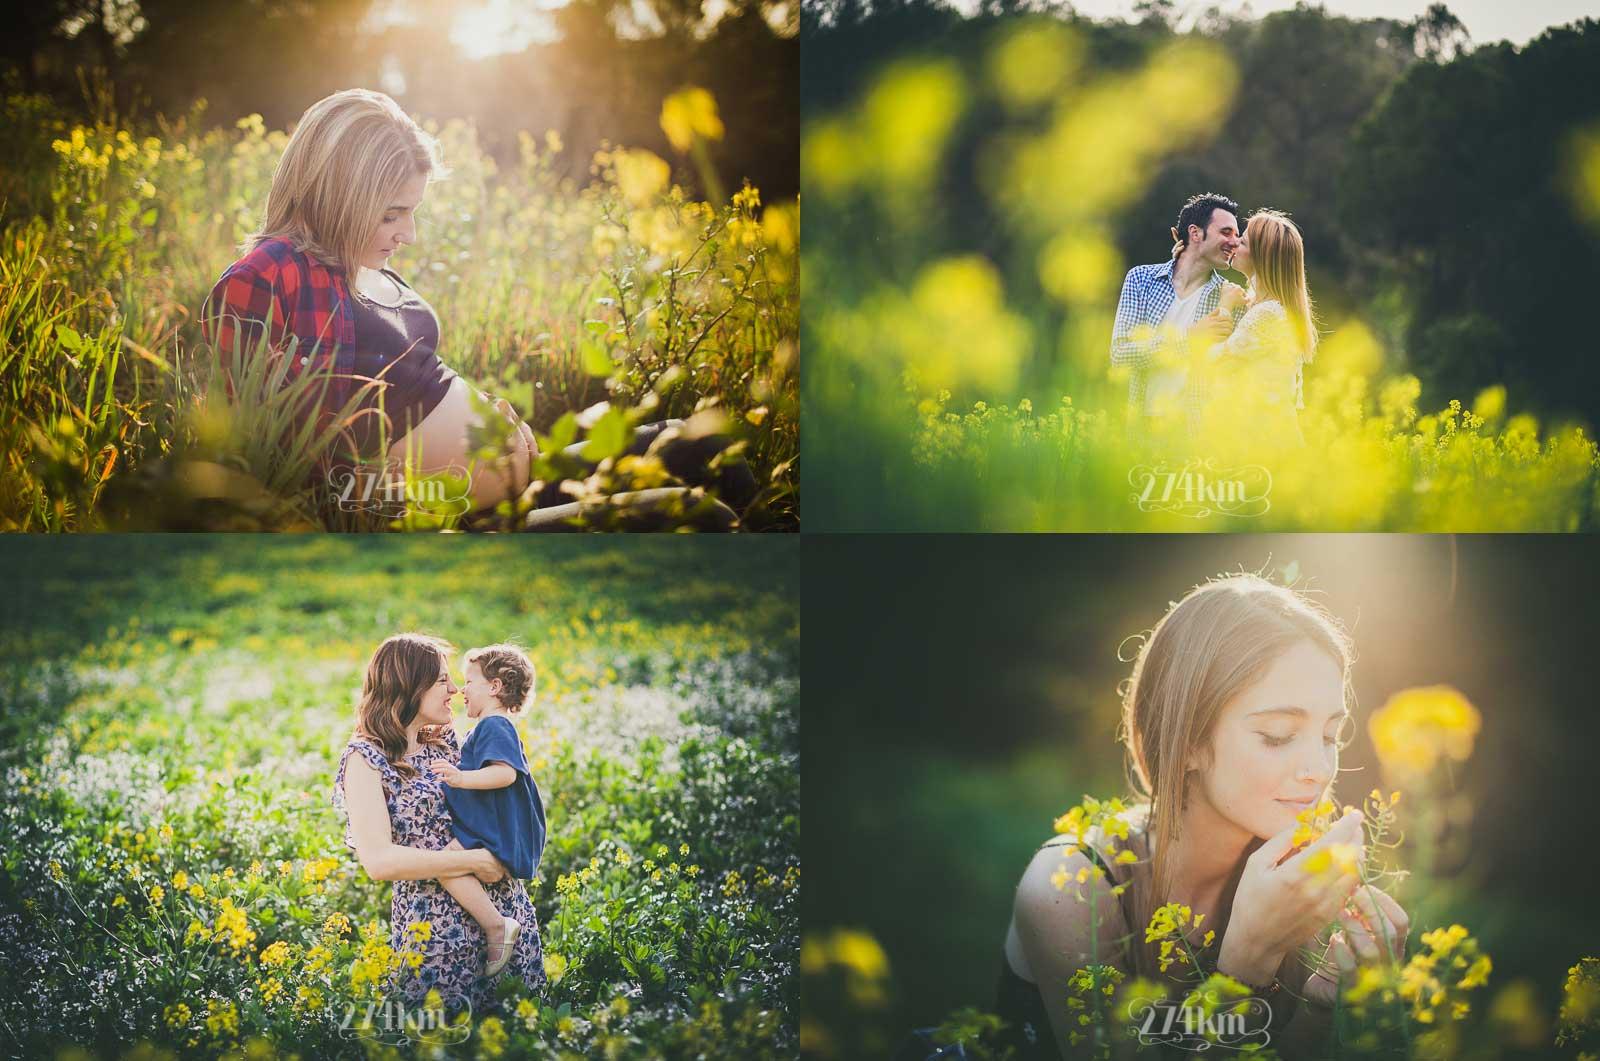 sesión de fotos en exterior en primavera campo flores barcelona